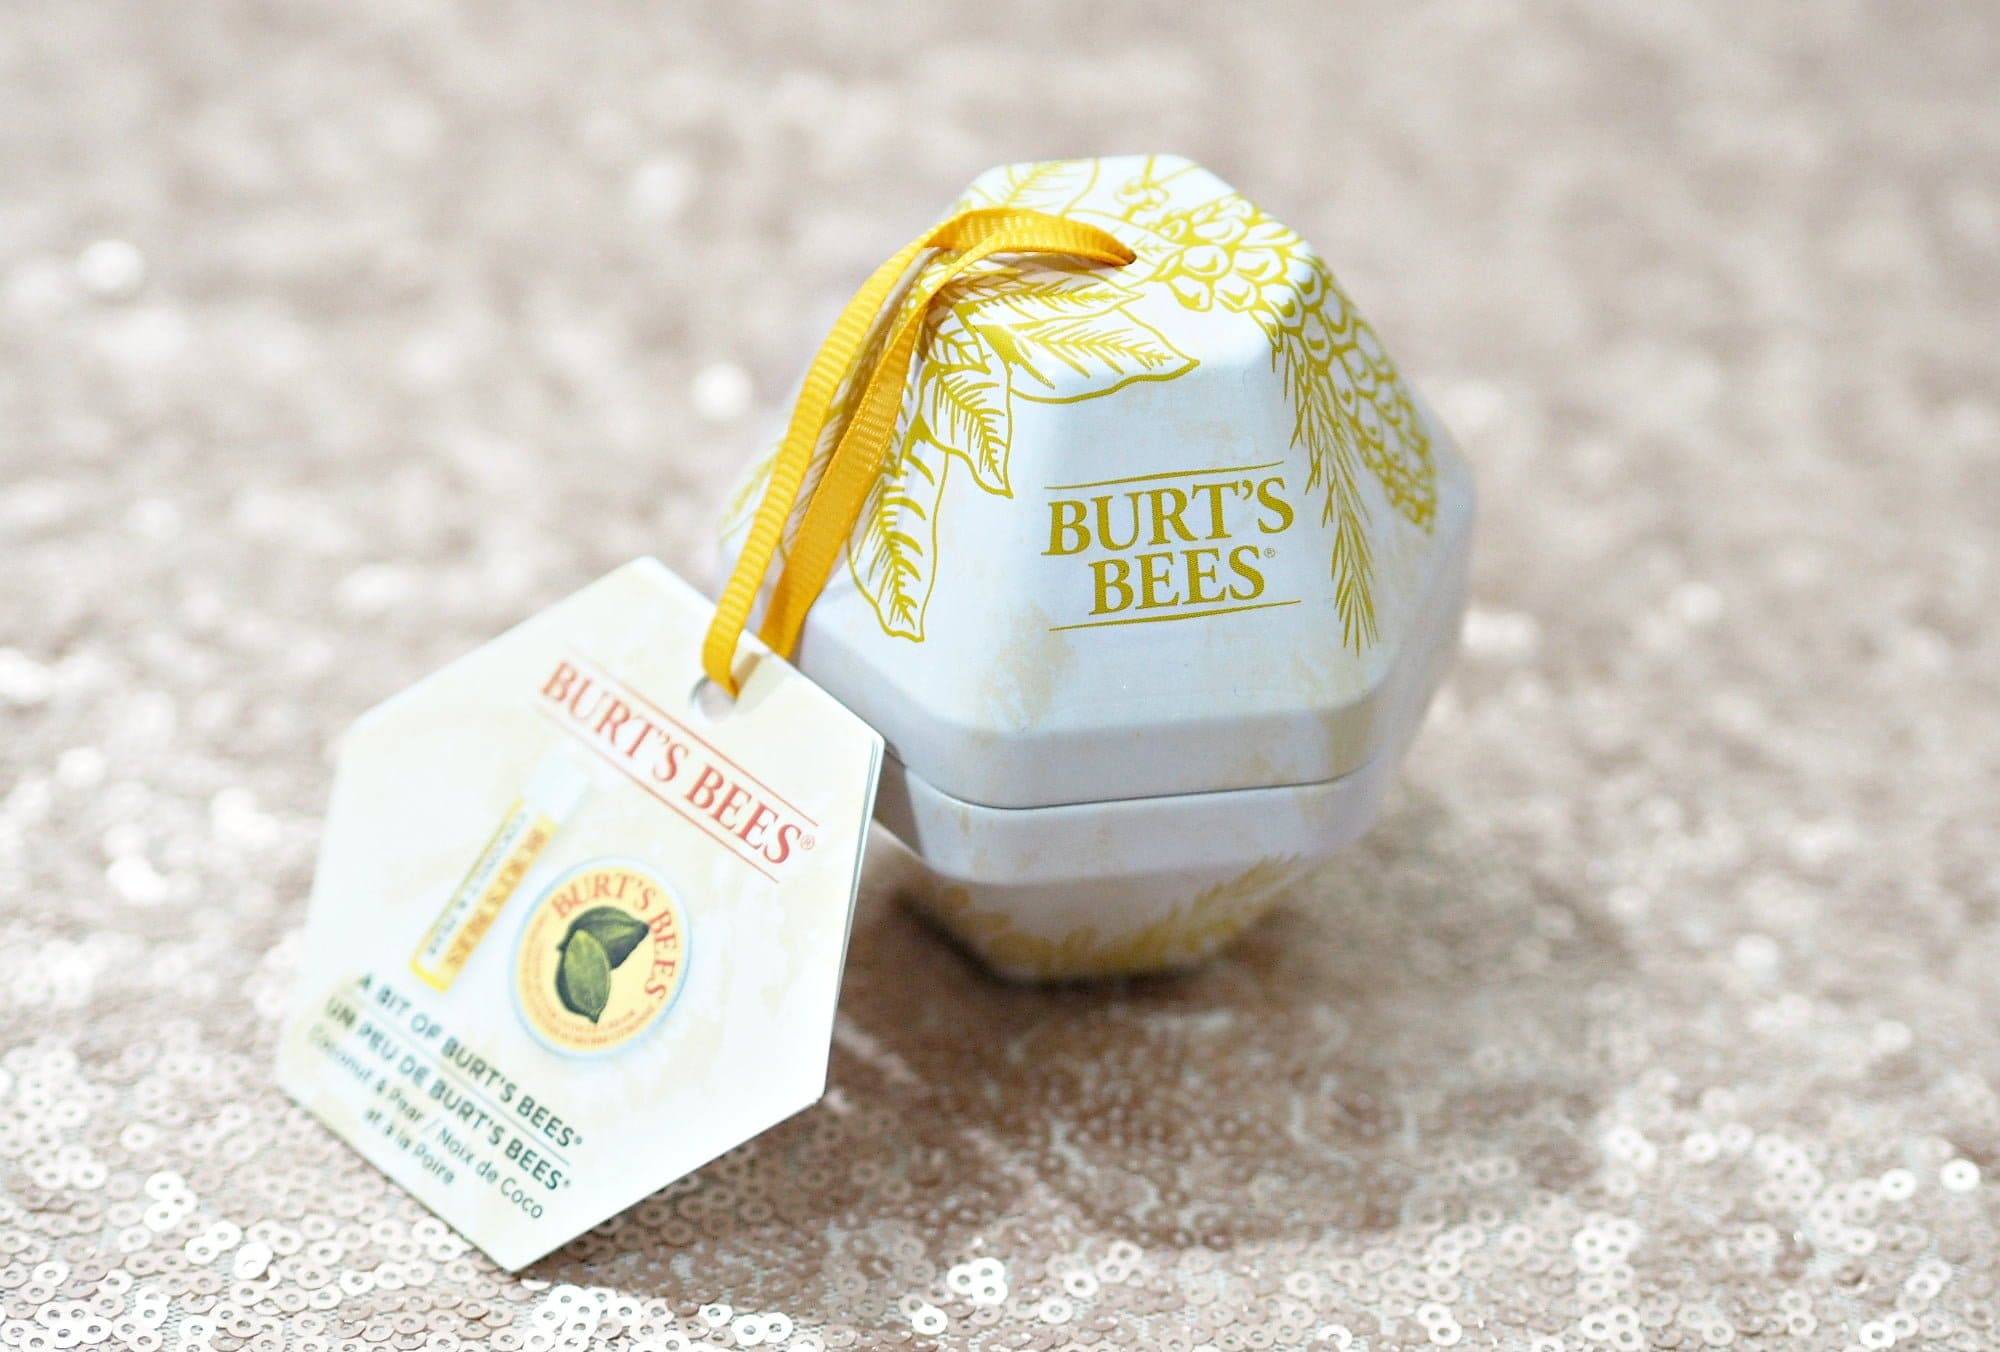 Burt's Bees Stocking Fillers